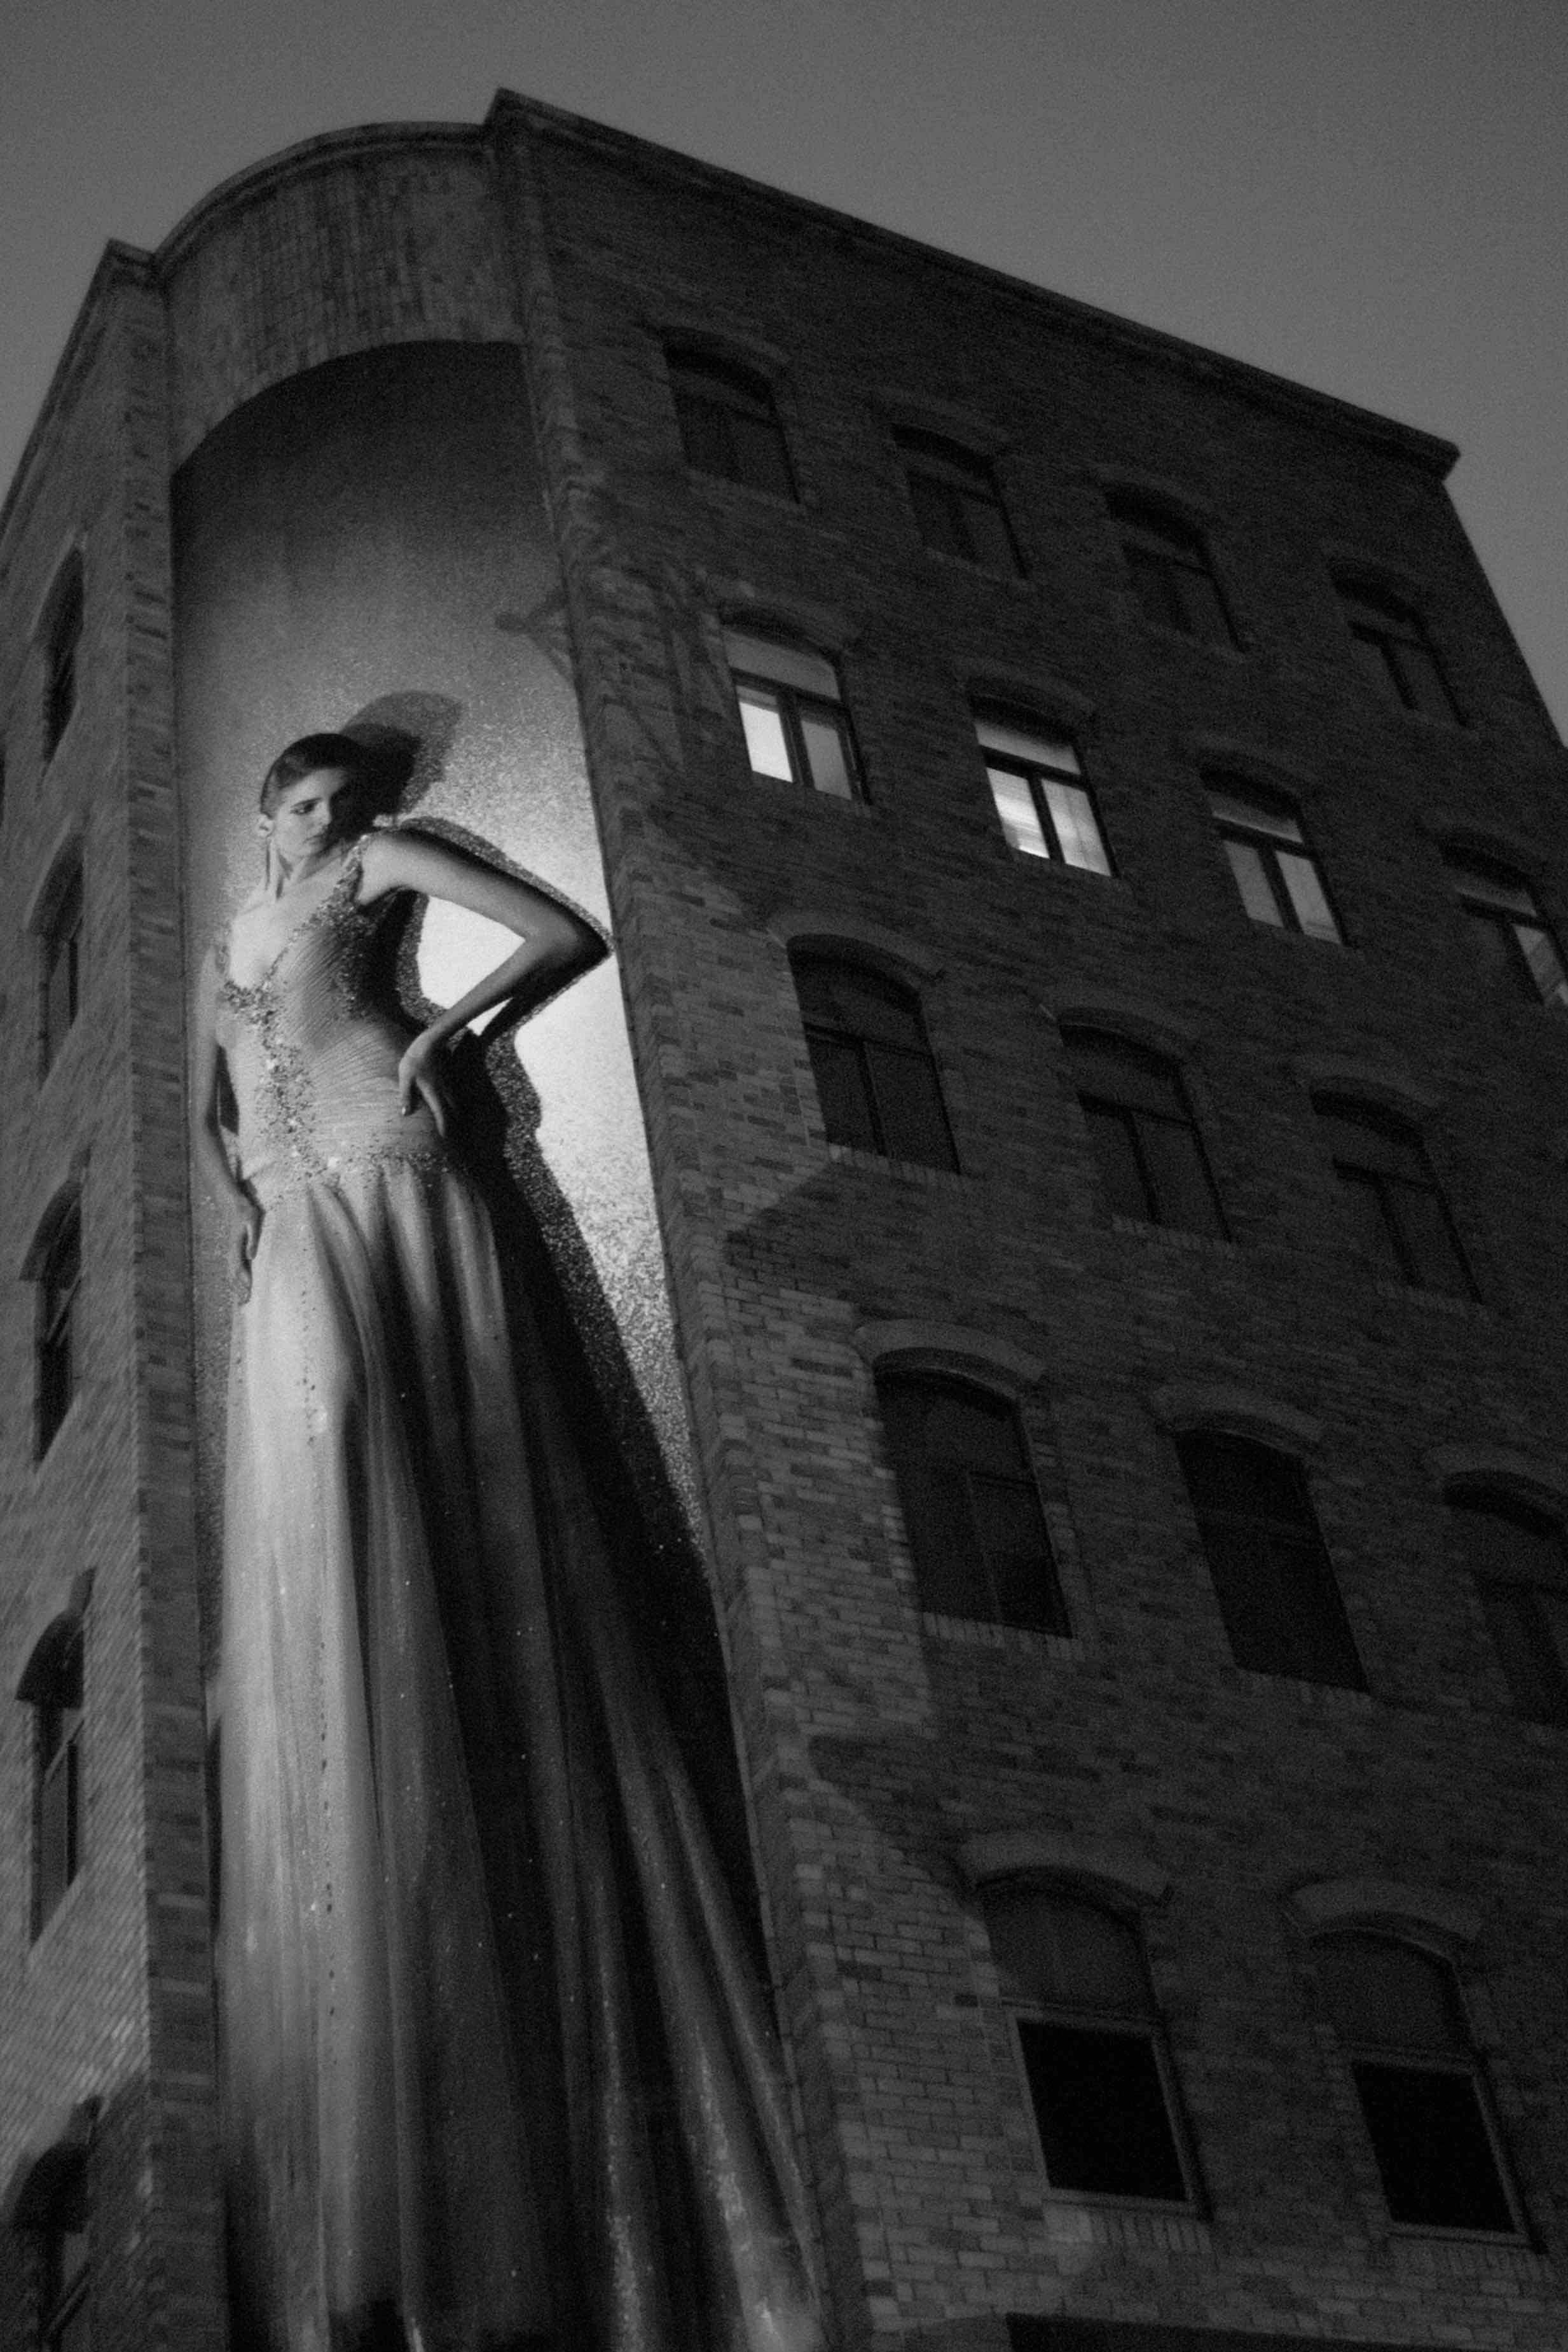 Fotó: Bartis Attila: Óriásplakát éjjel, Tajpej, 2014